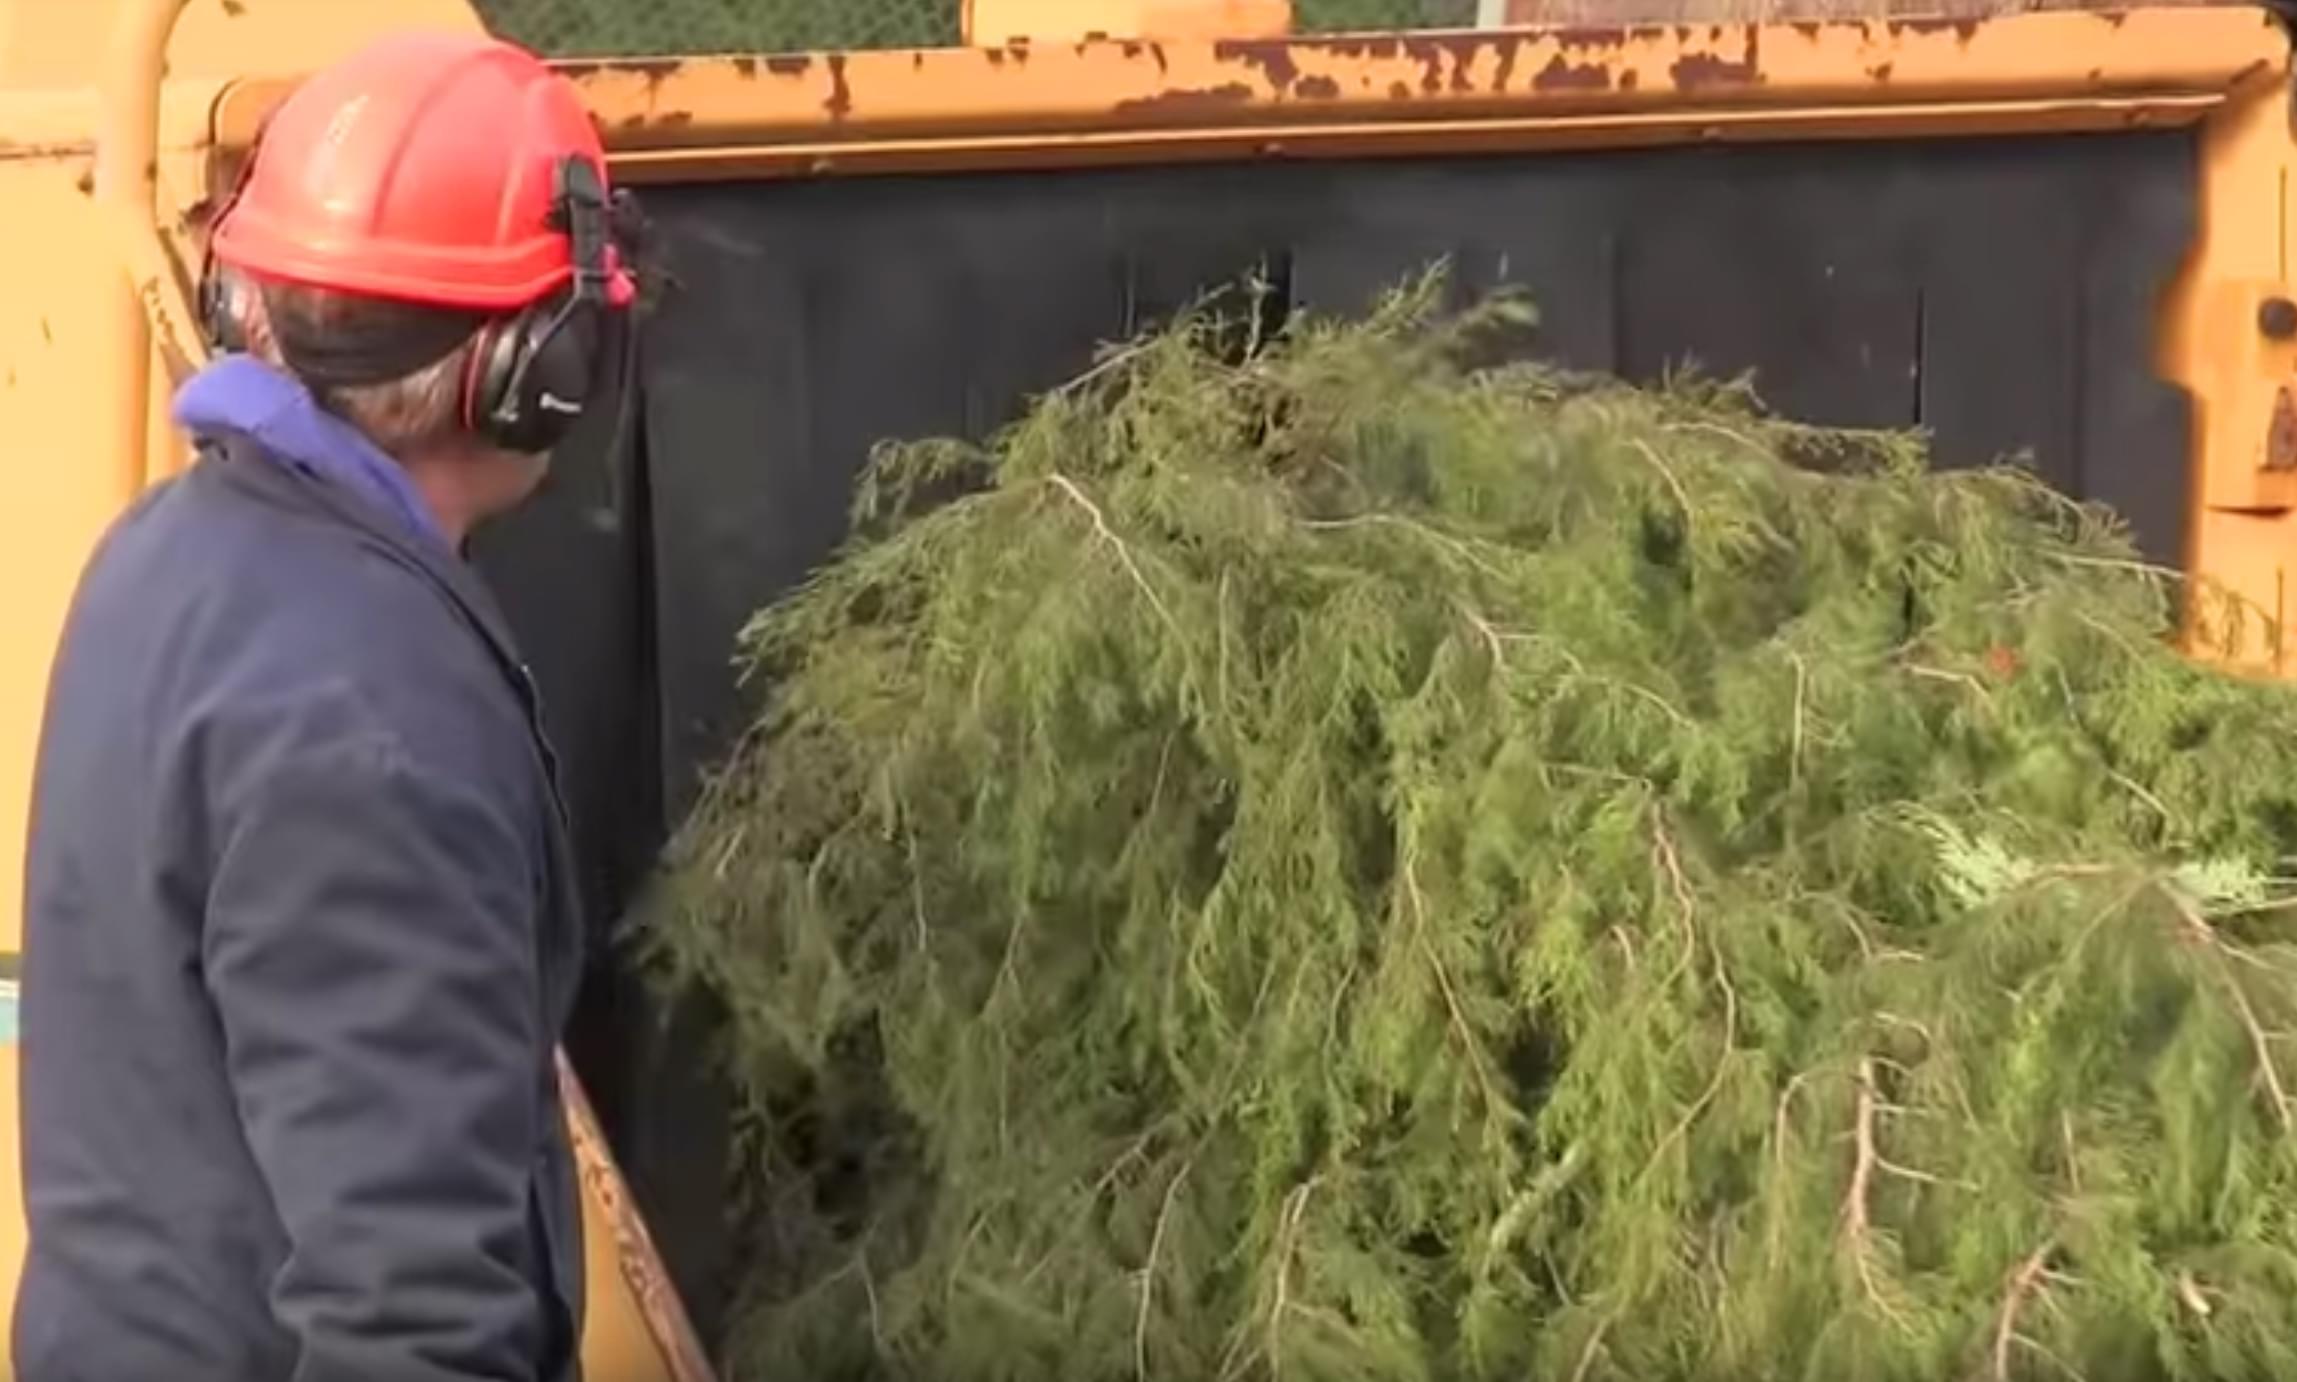 City of Chicago Christmas Tree recycling kicks off January 5th